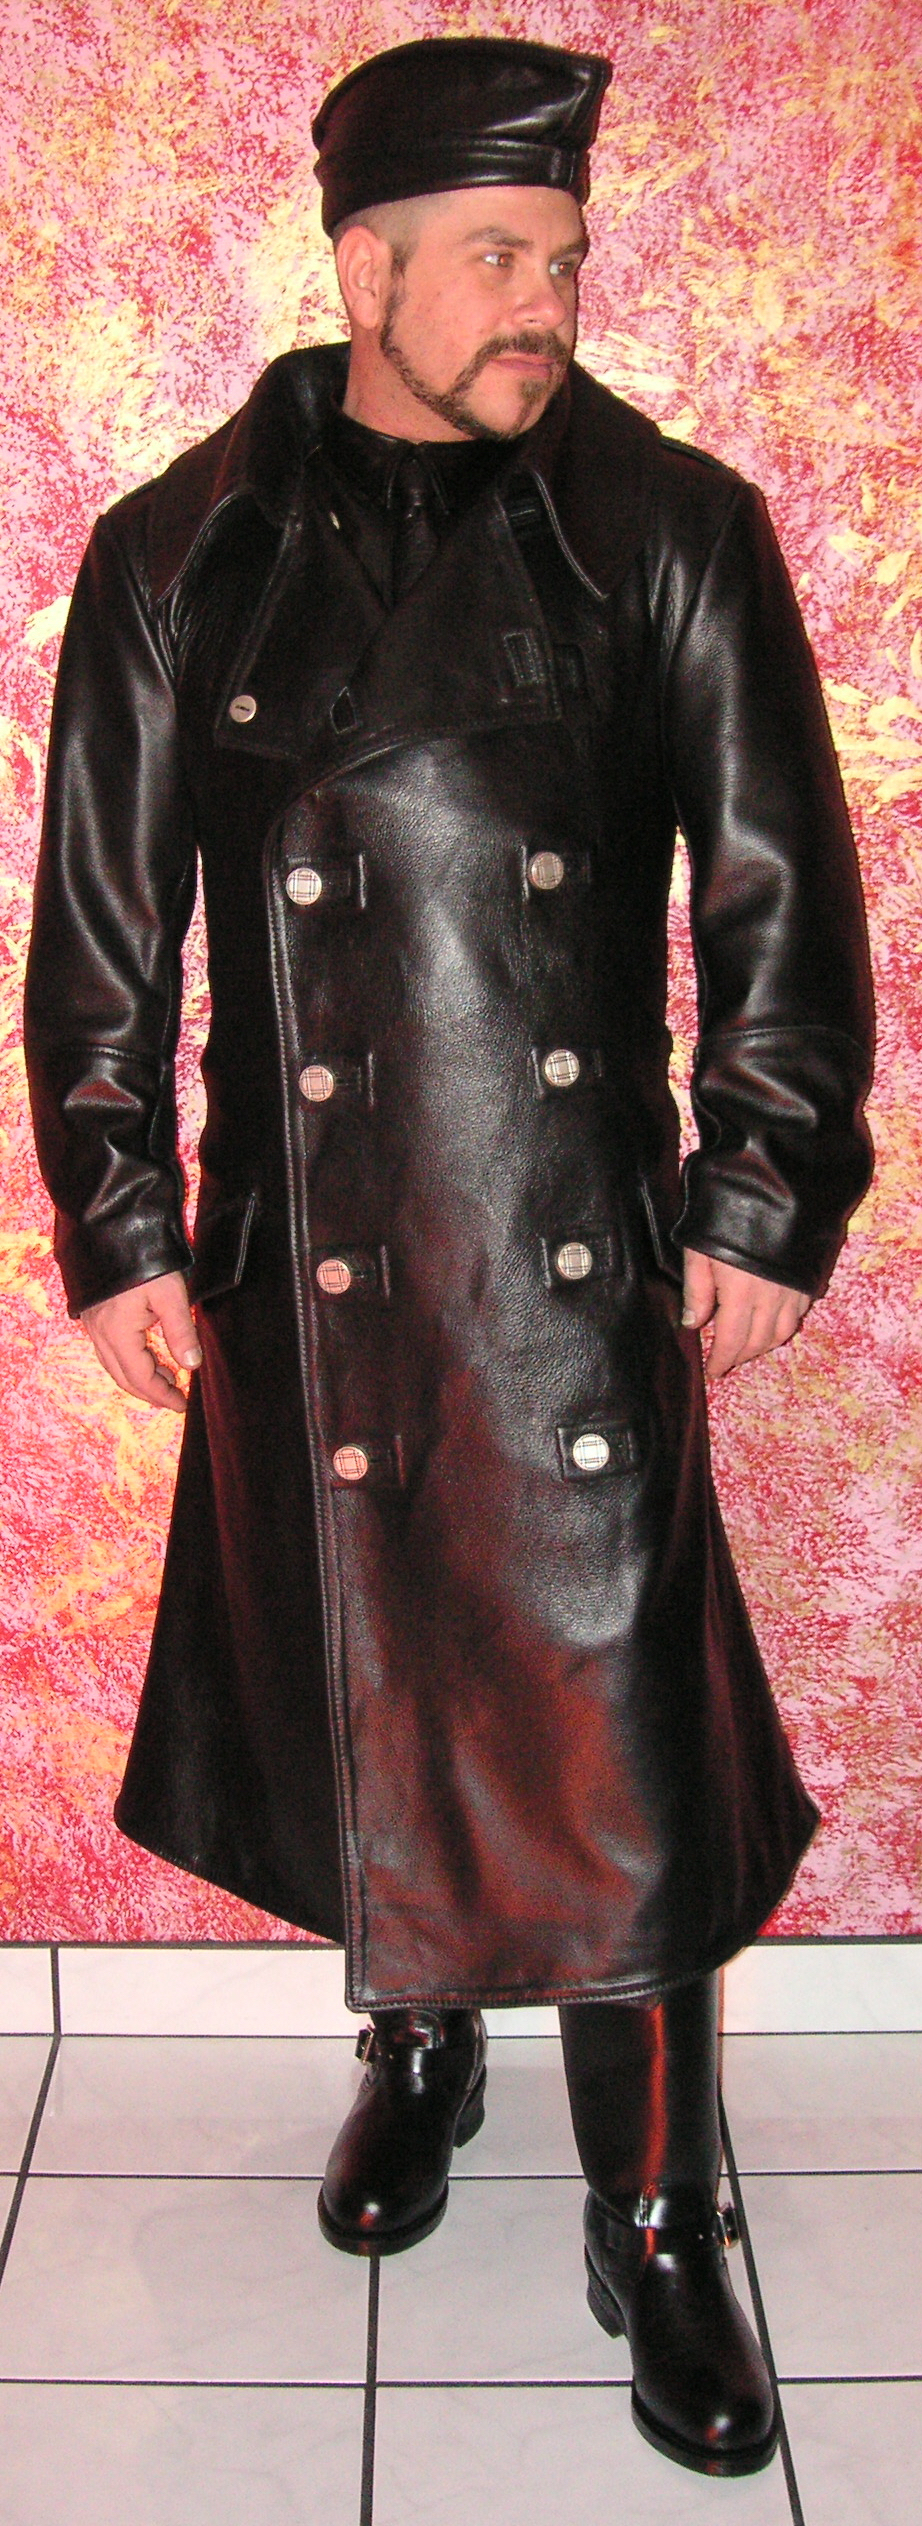 ron-leather-4.jpg